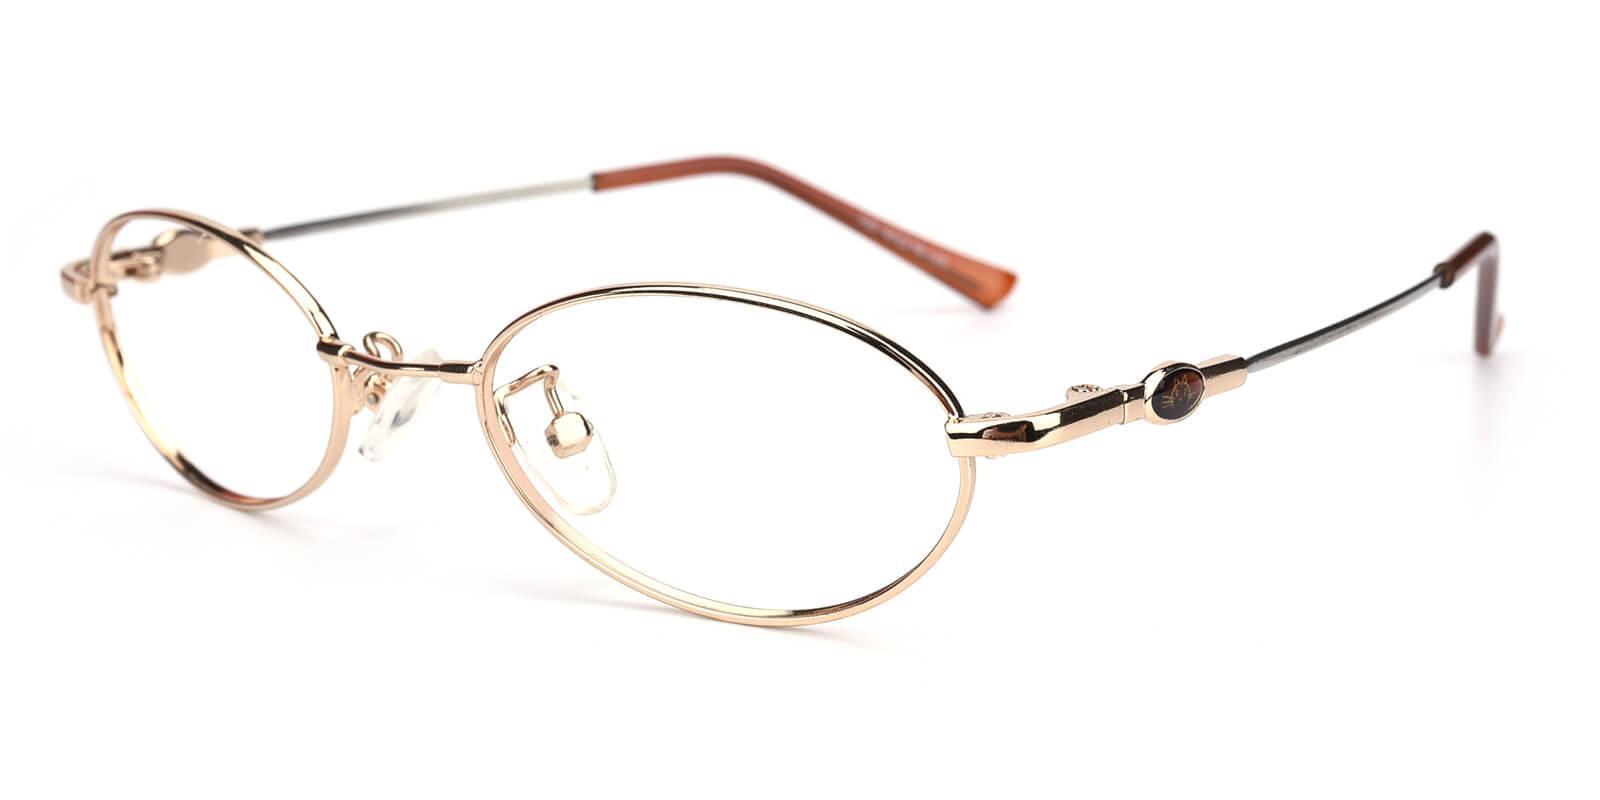 Mikestar-Gold-Oval-Titanium-Eyeglasses-additional1